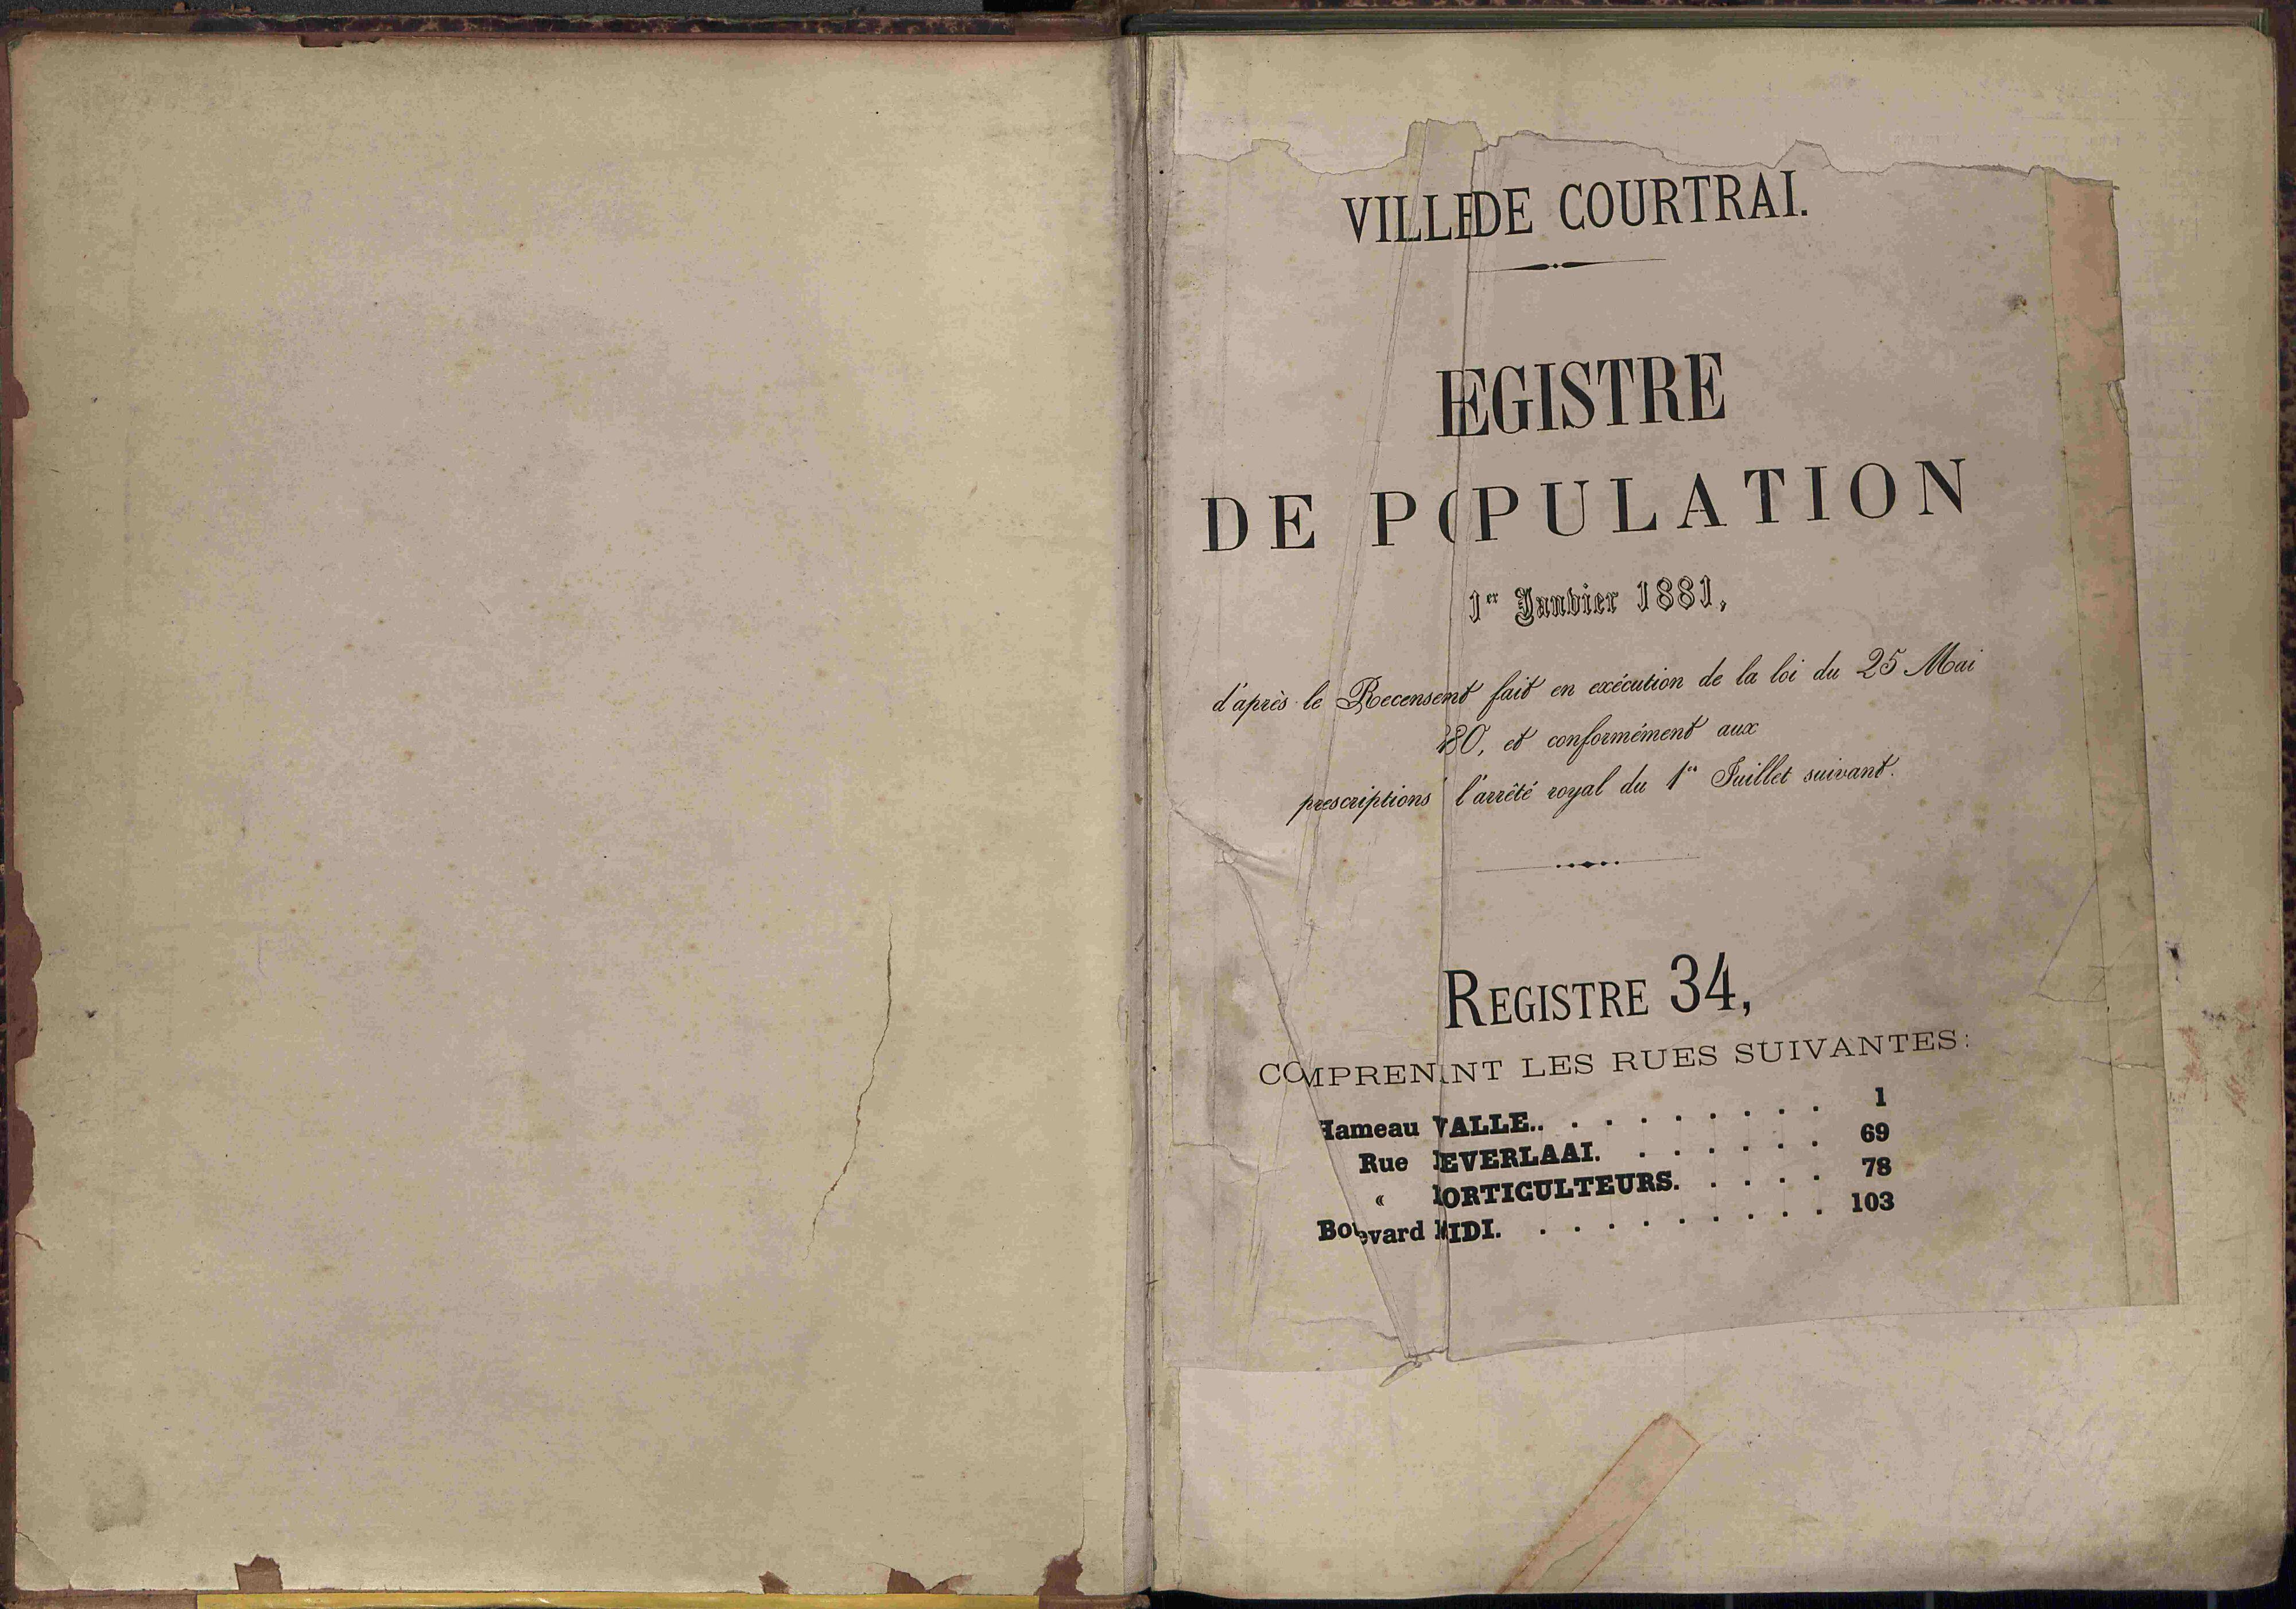 Bevolkingsregister Kortrijk 1880 boek 34